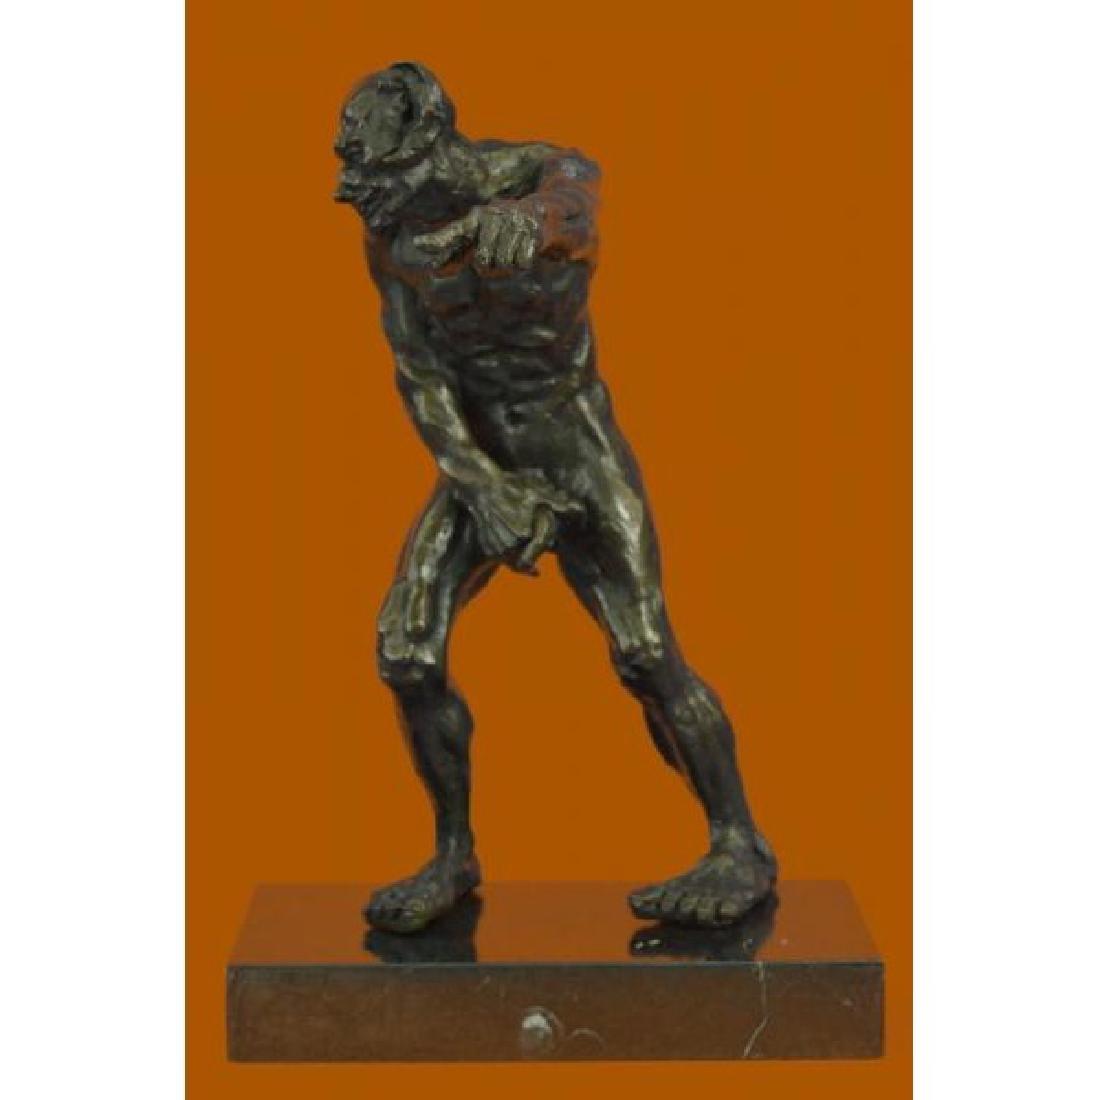 Devil Holding His Phallus Bronze Sculpture Limited